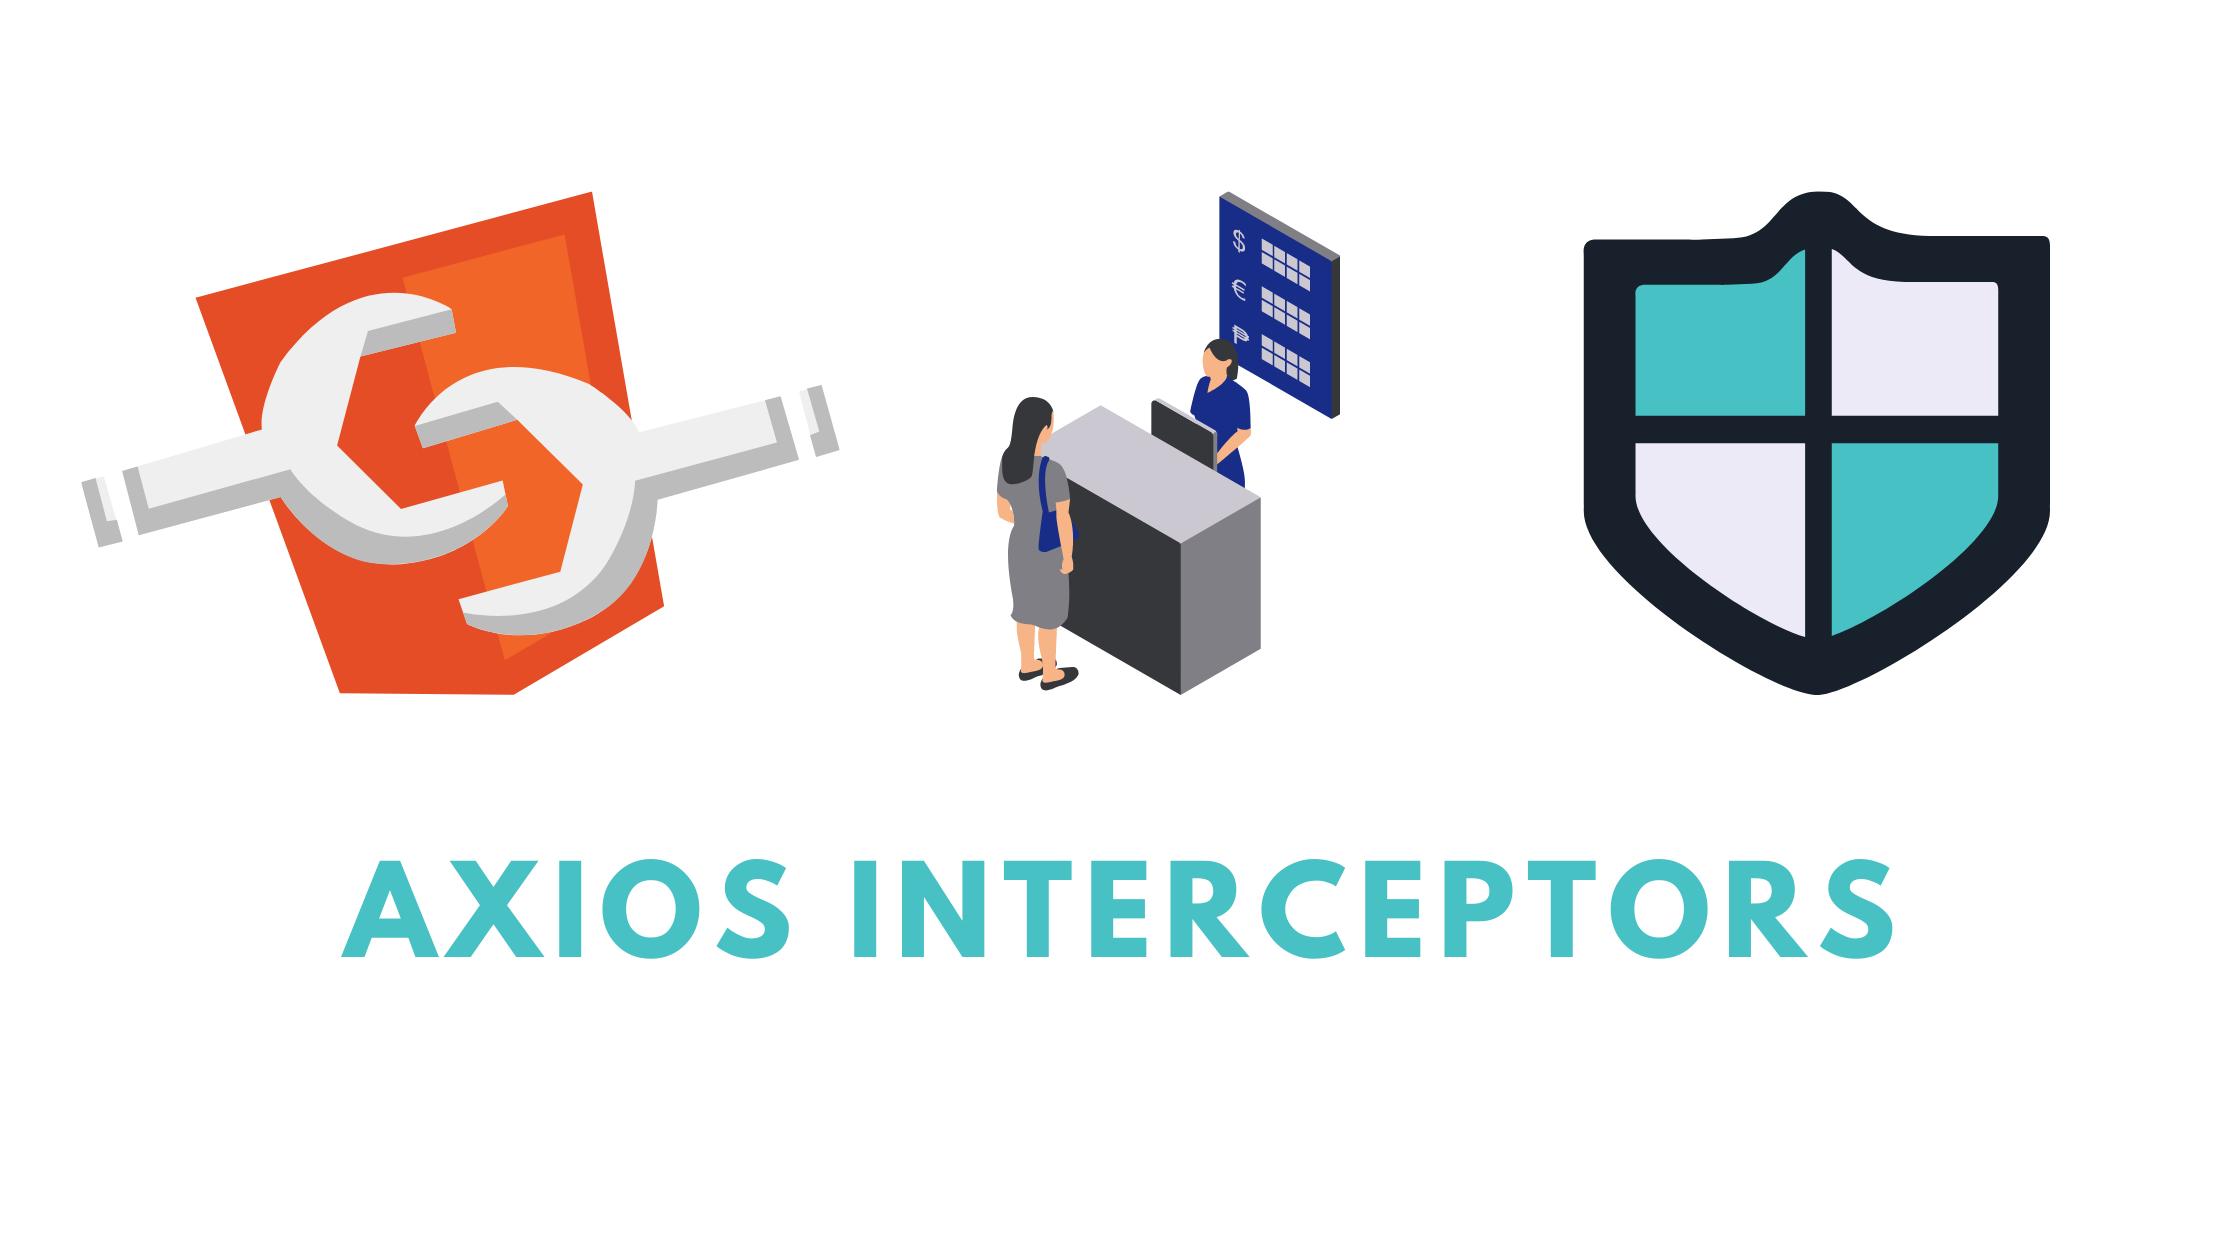 axios interceptors blog post header image